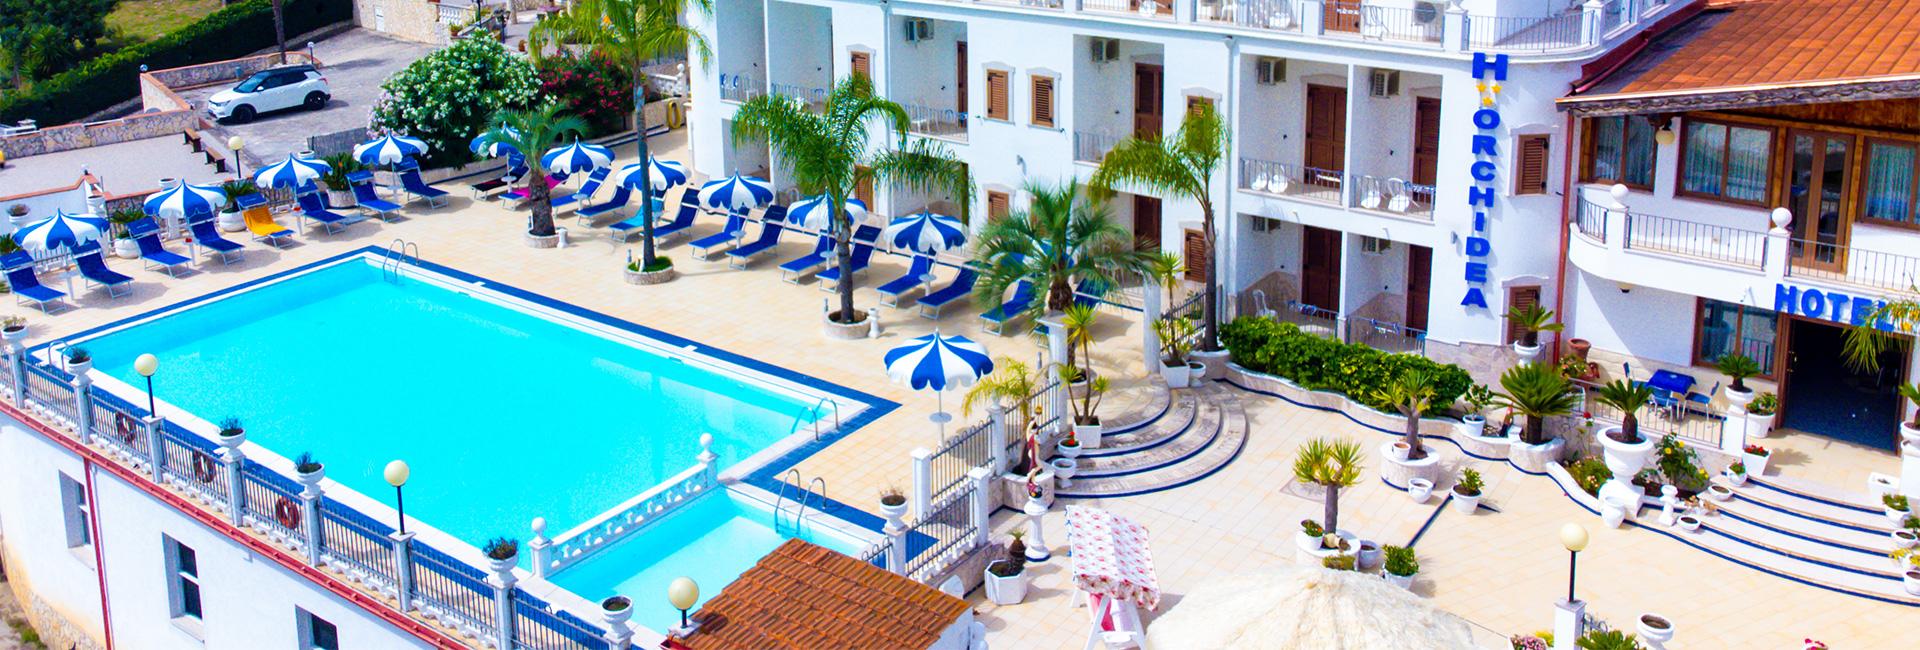 Hotel con piscina a peschici sul gargano for Pepito piscina